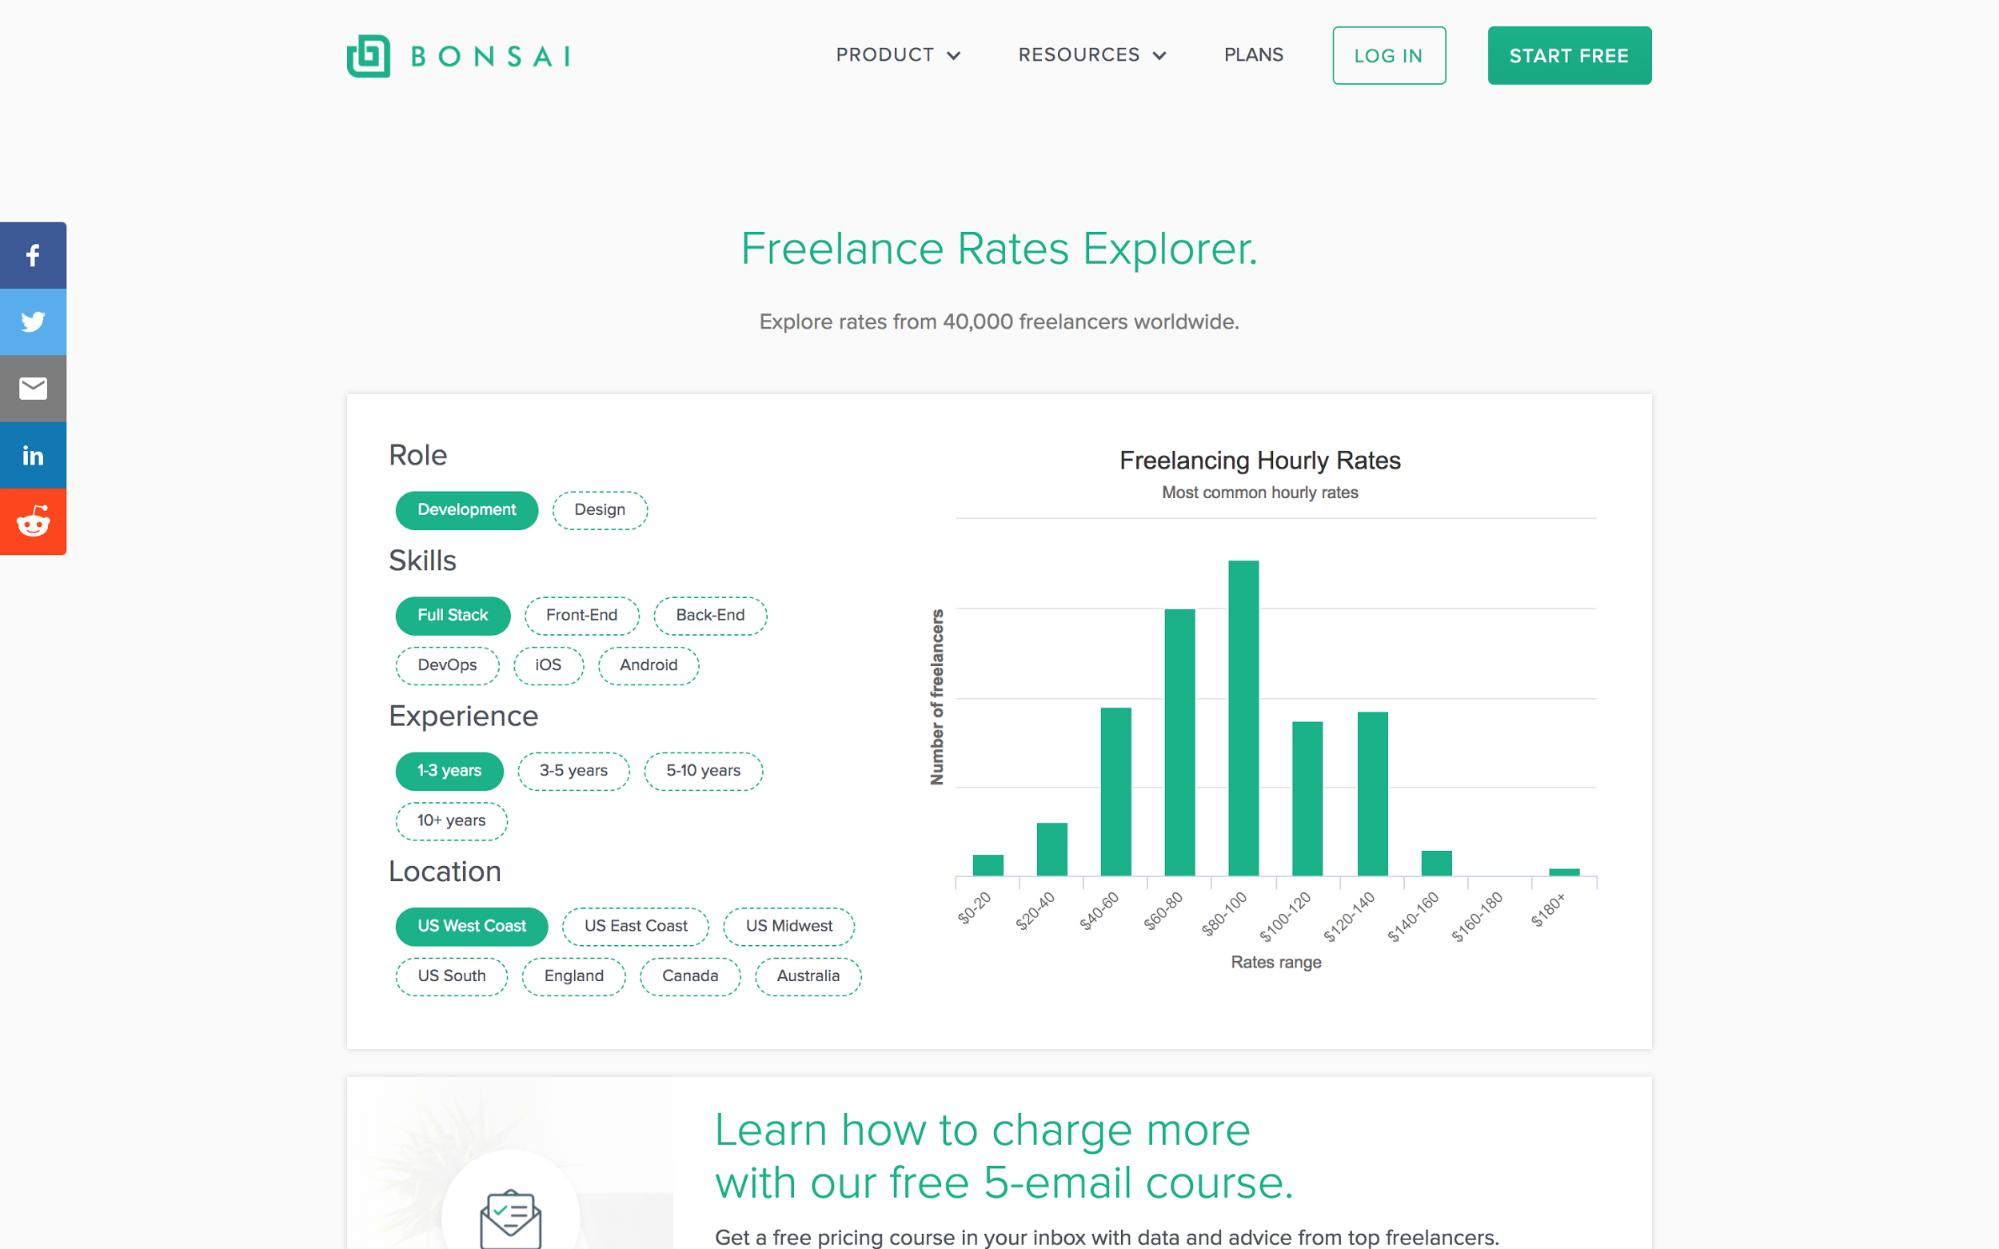 Bonsai freelance rates